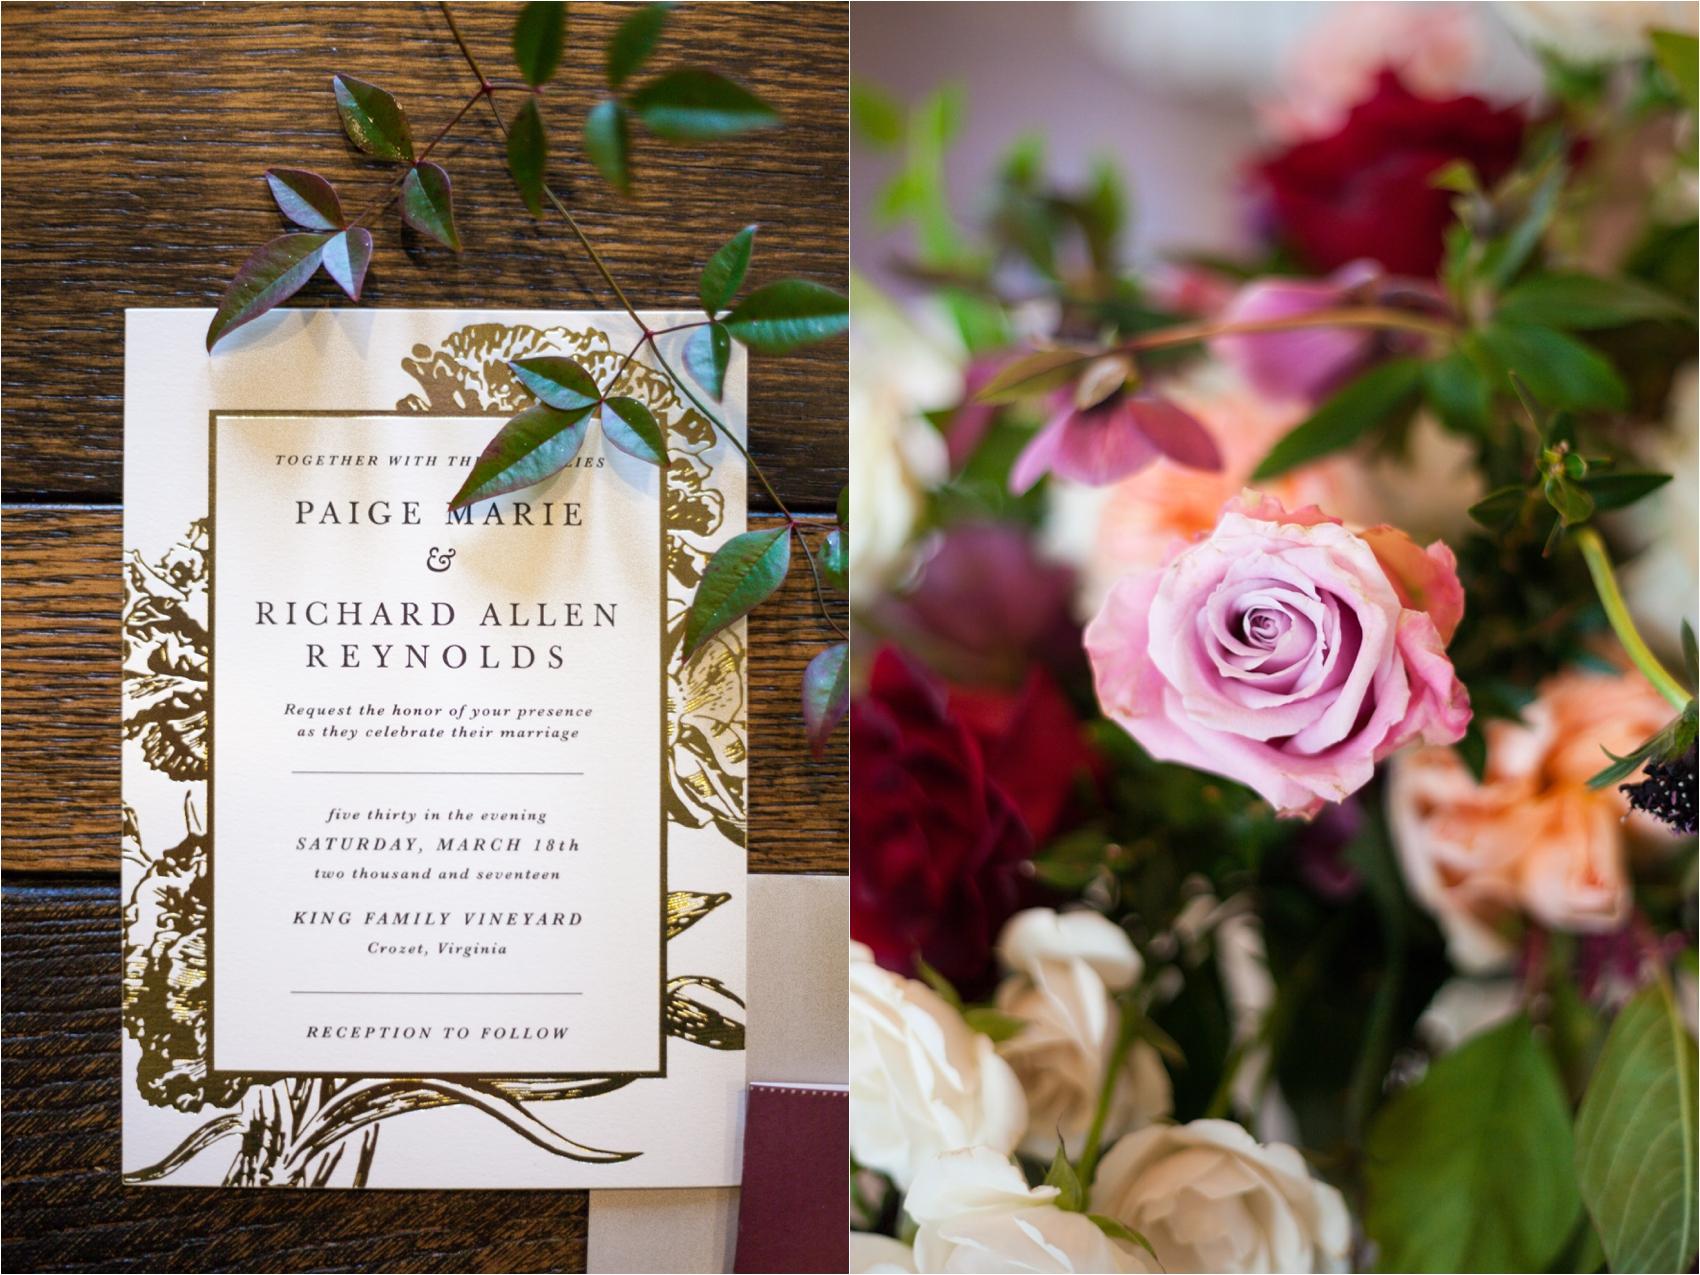 King-Family-Vineyard-Spring-Virginia-Wedding-0993.jpg